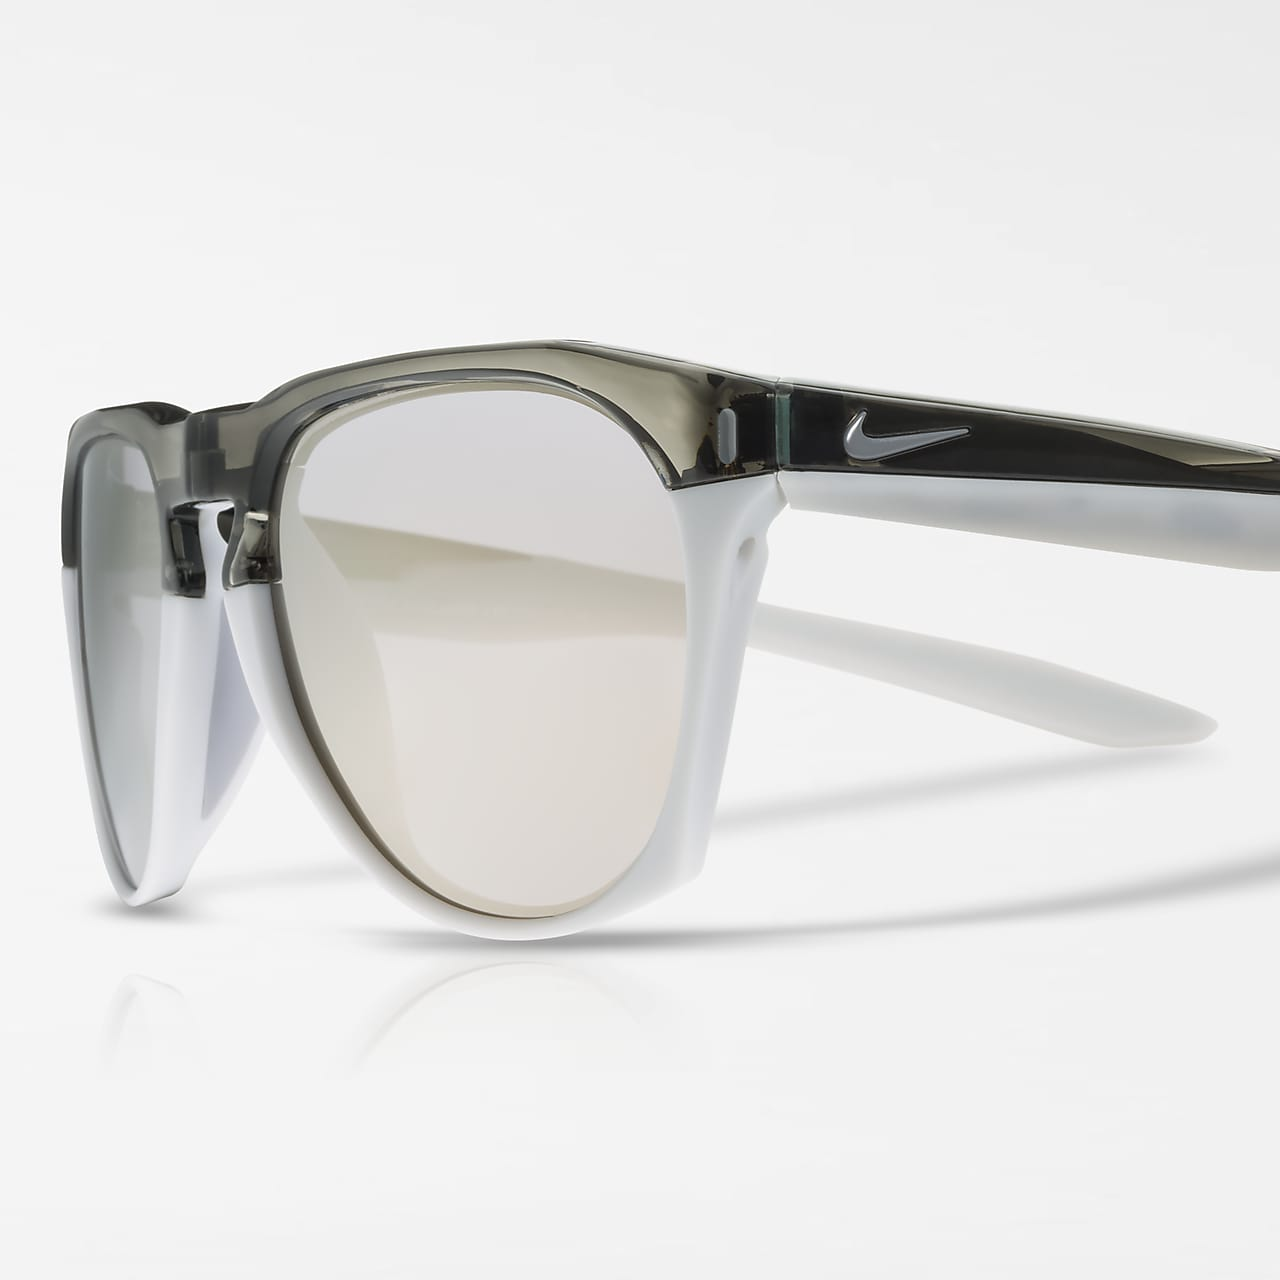 Nike Essential Navigator Mirrored Sunglasses